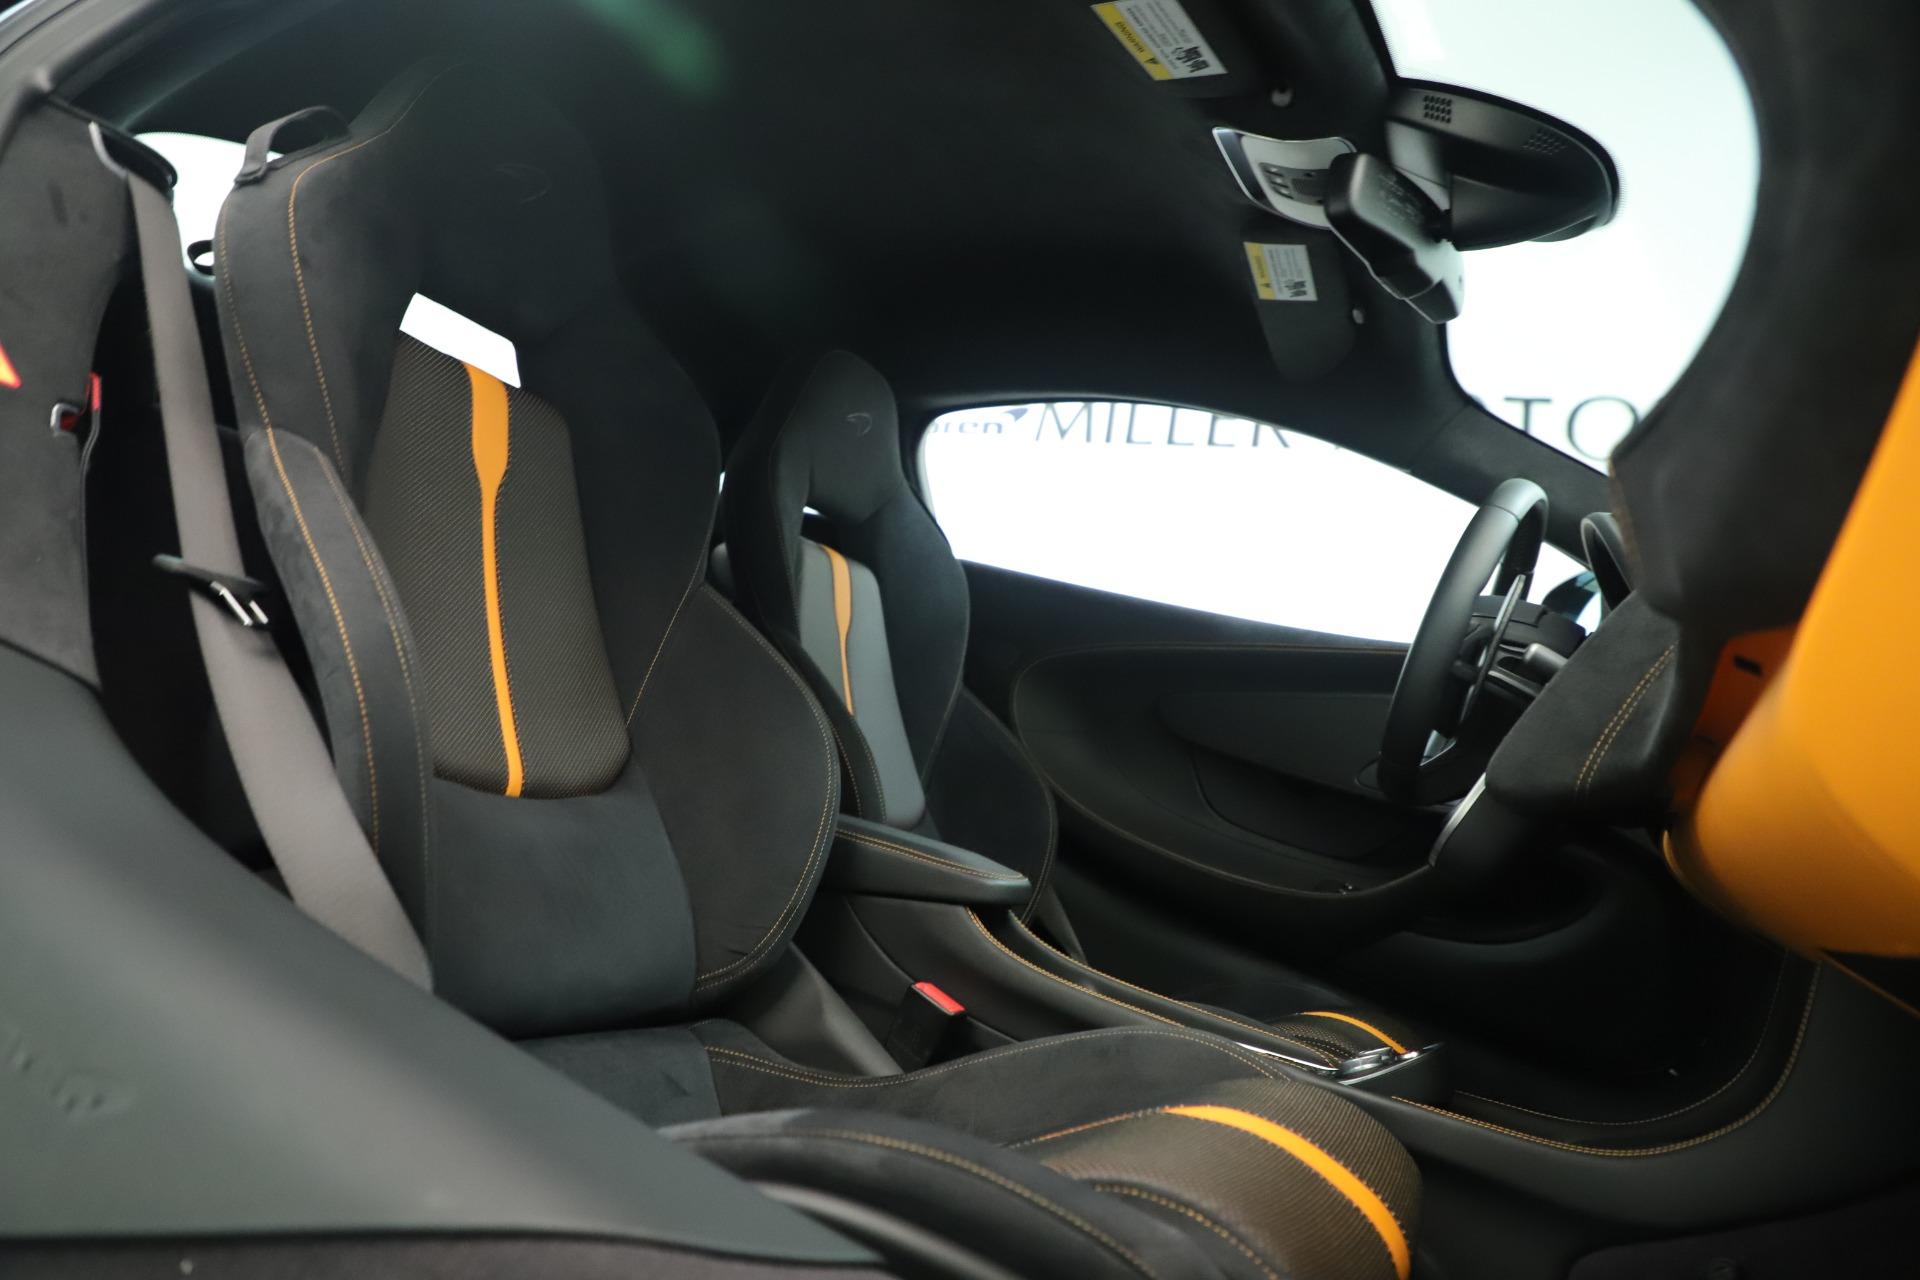 Used 2016 McLaren 570S Coupe For Sale In Westport, CT 3433_p18